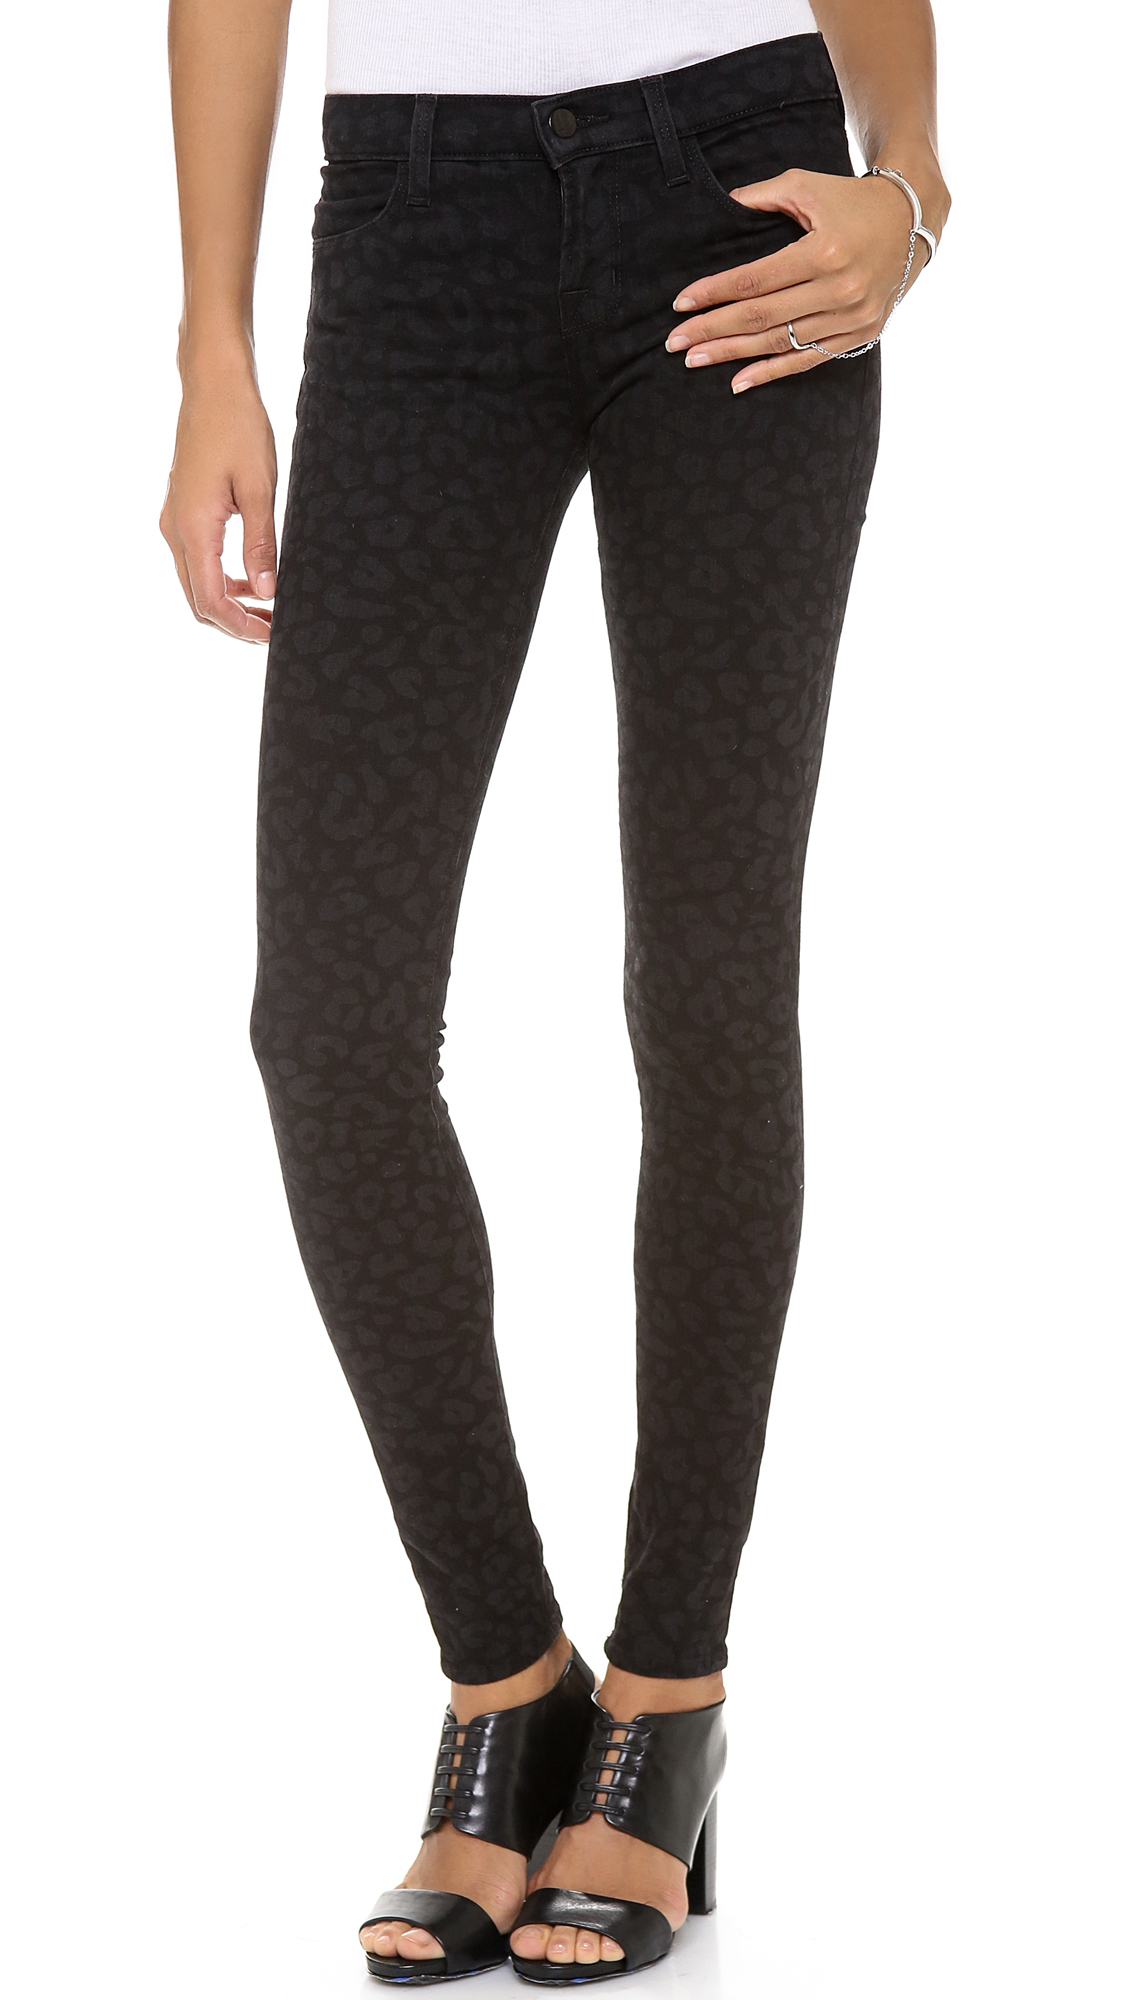 J brand 620' mid rise skinny jeans (blackout)